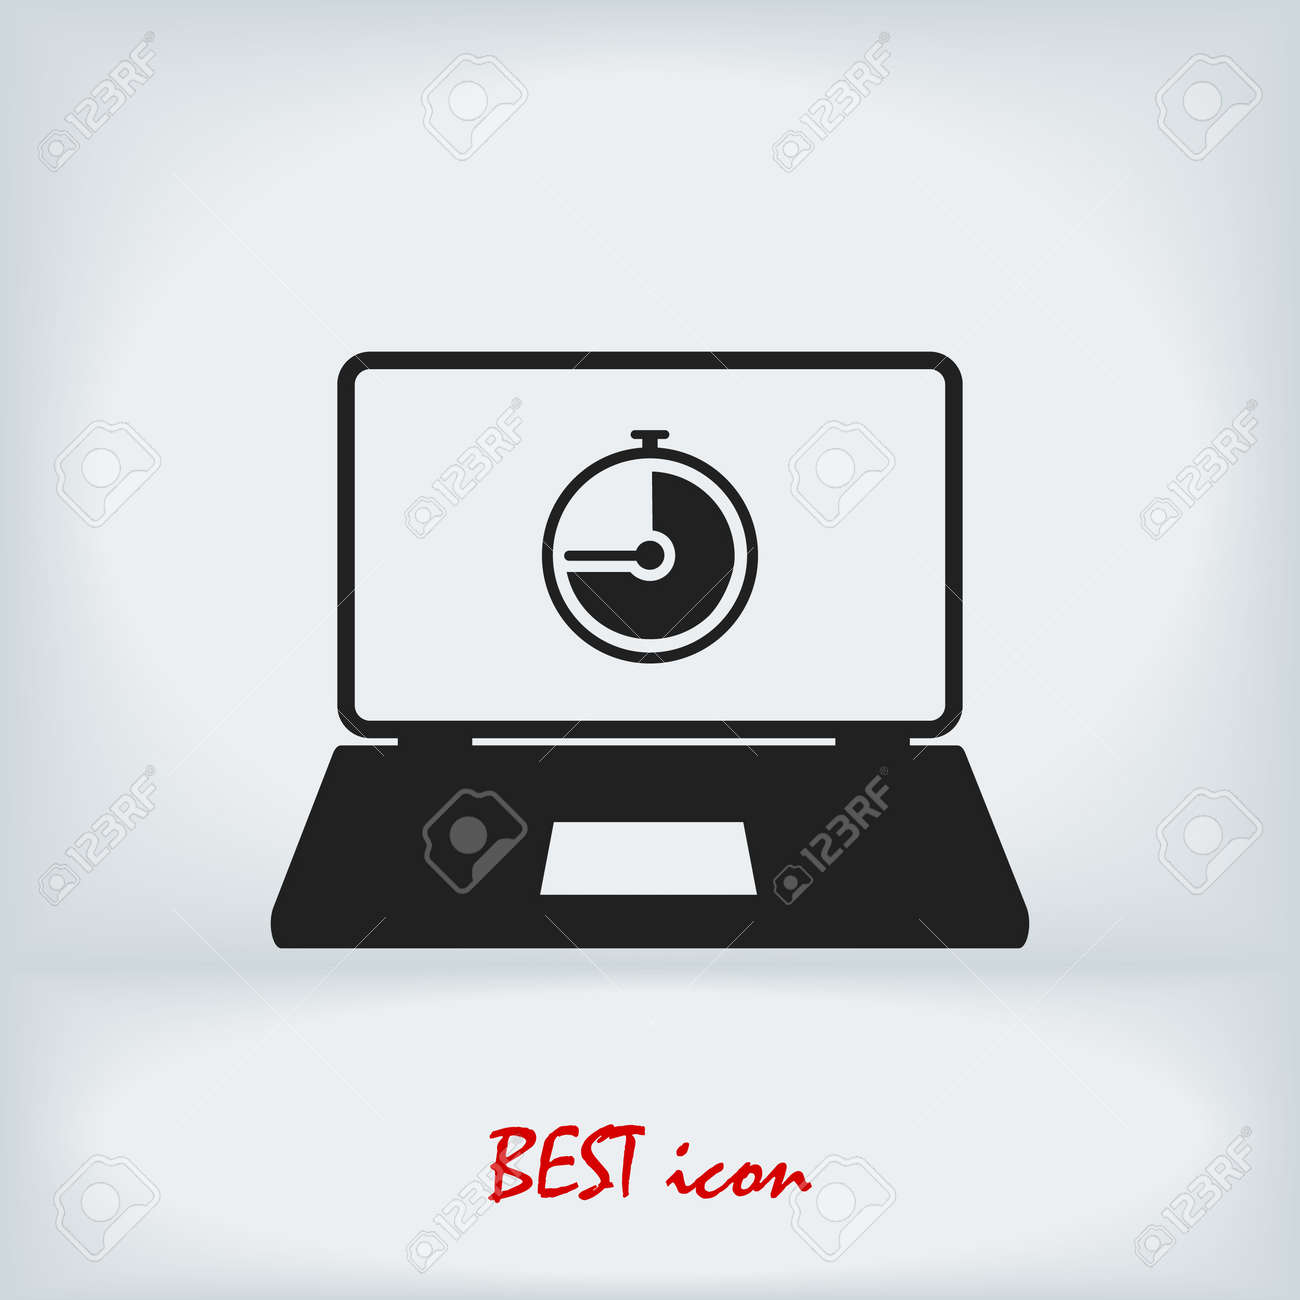 laptop icon, stock vector illustration flat design style - 153933394